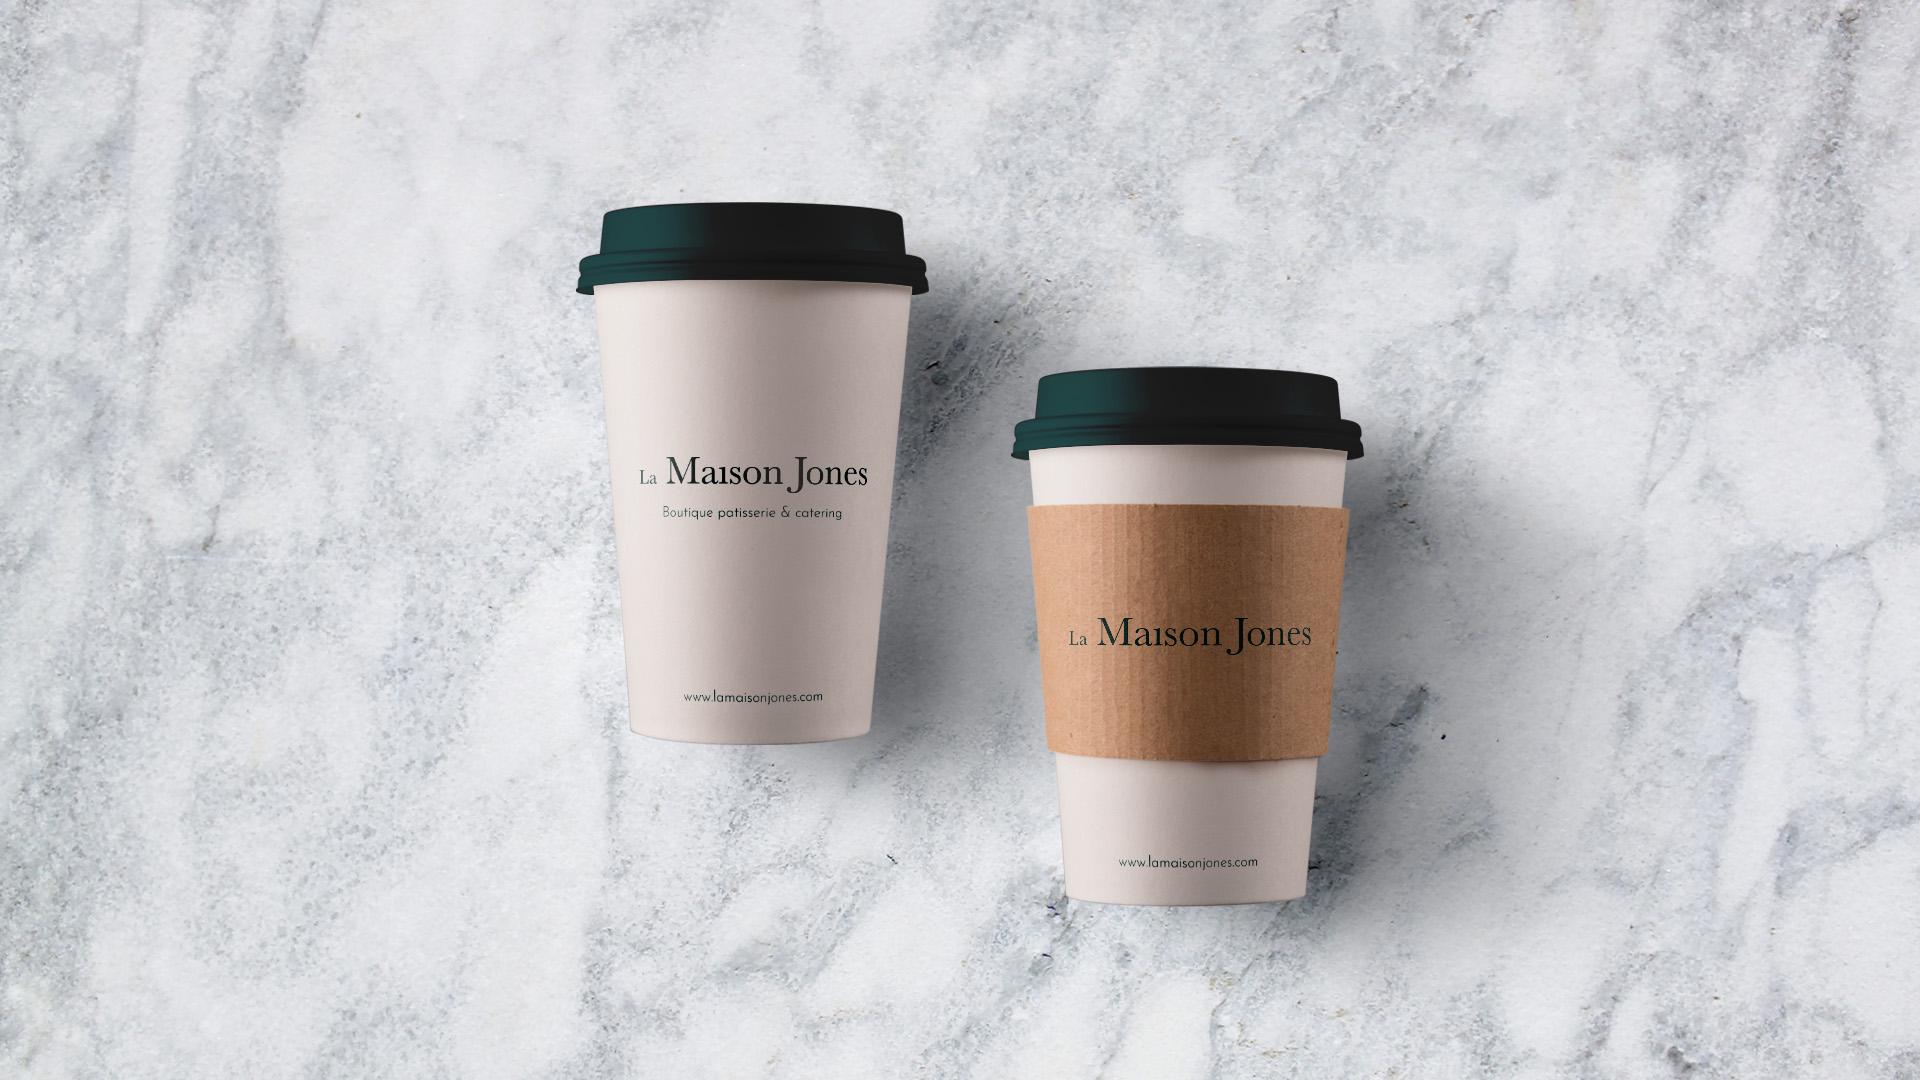 02-Lobo-Creative-La-Maison-Jones-Restaurant-branding-logo-design-case-study.jpg